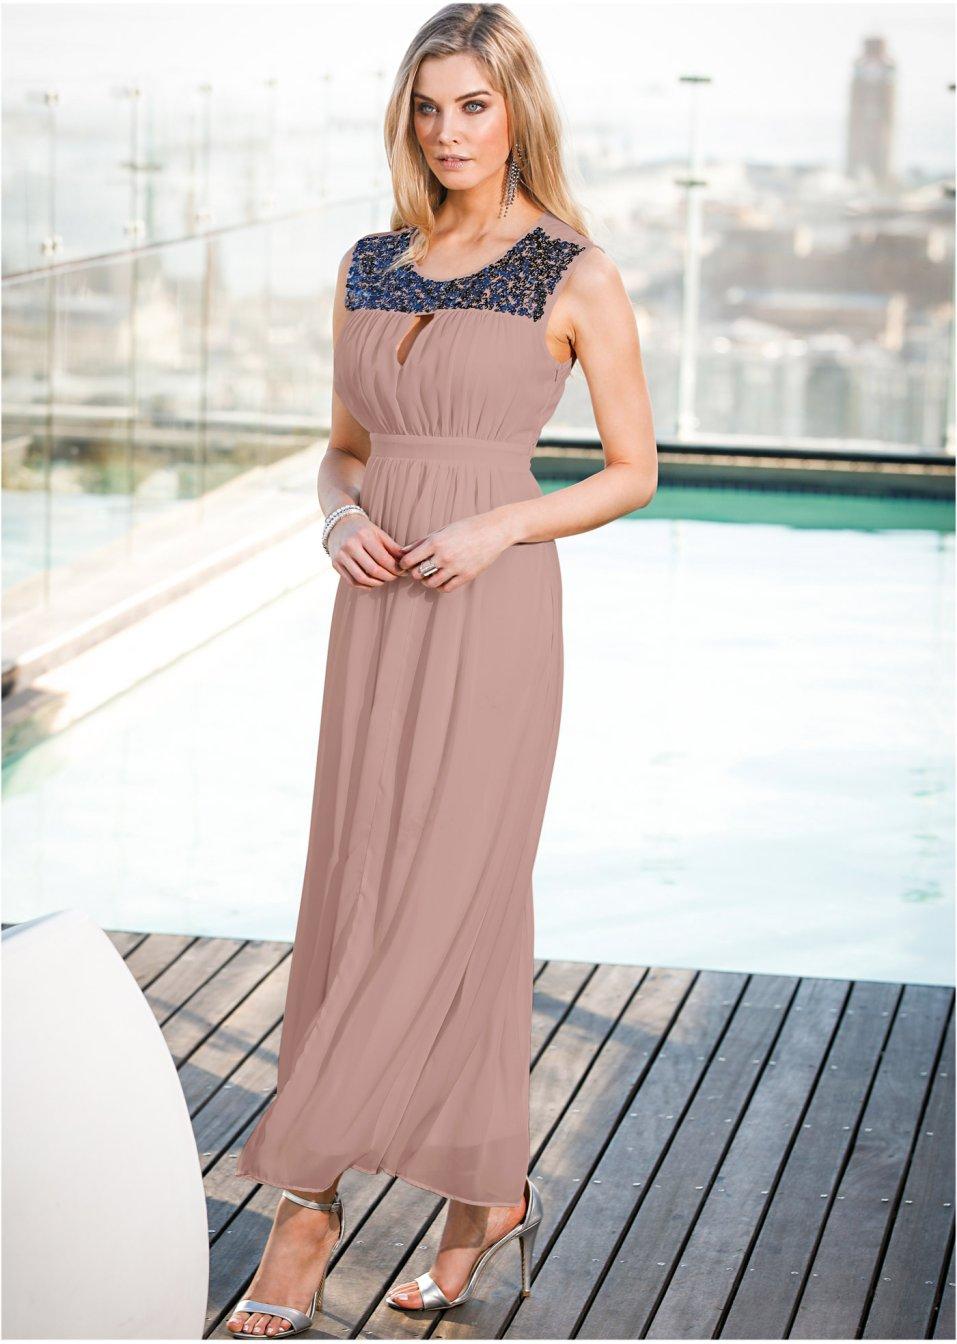 1f11999128 Robe maxi longue rose vintage - Femme - bonprix-wa.be